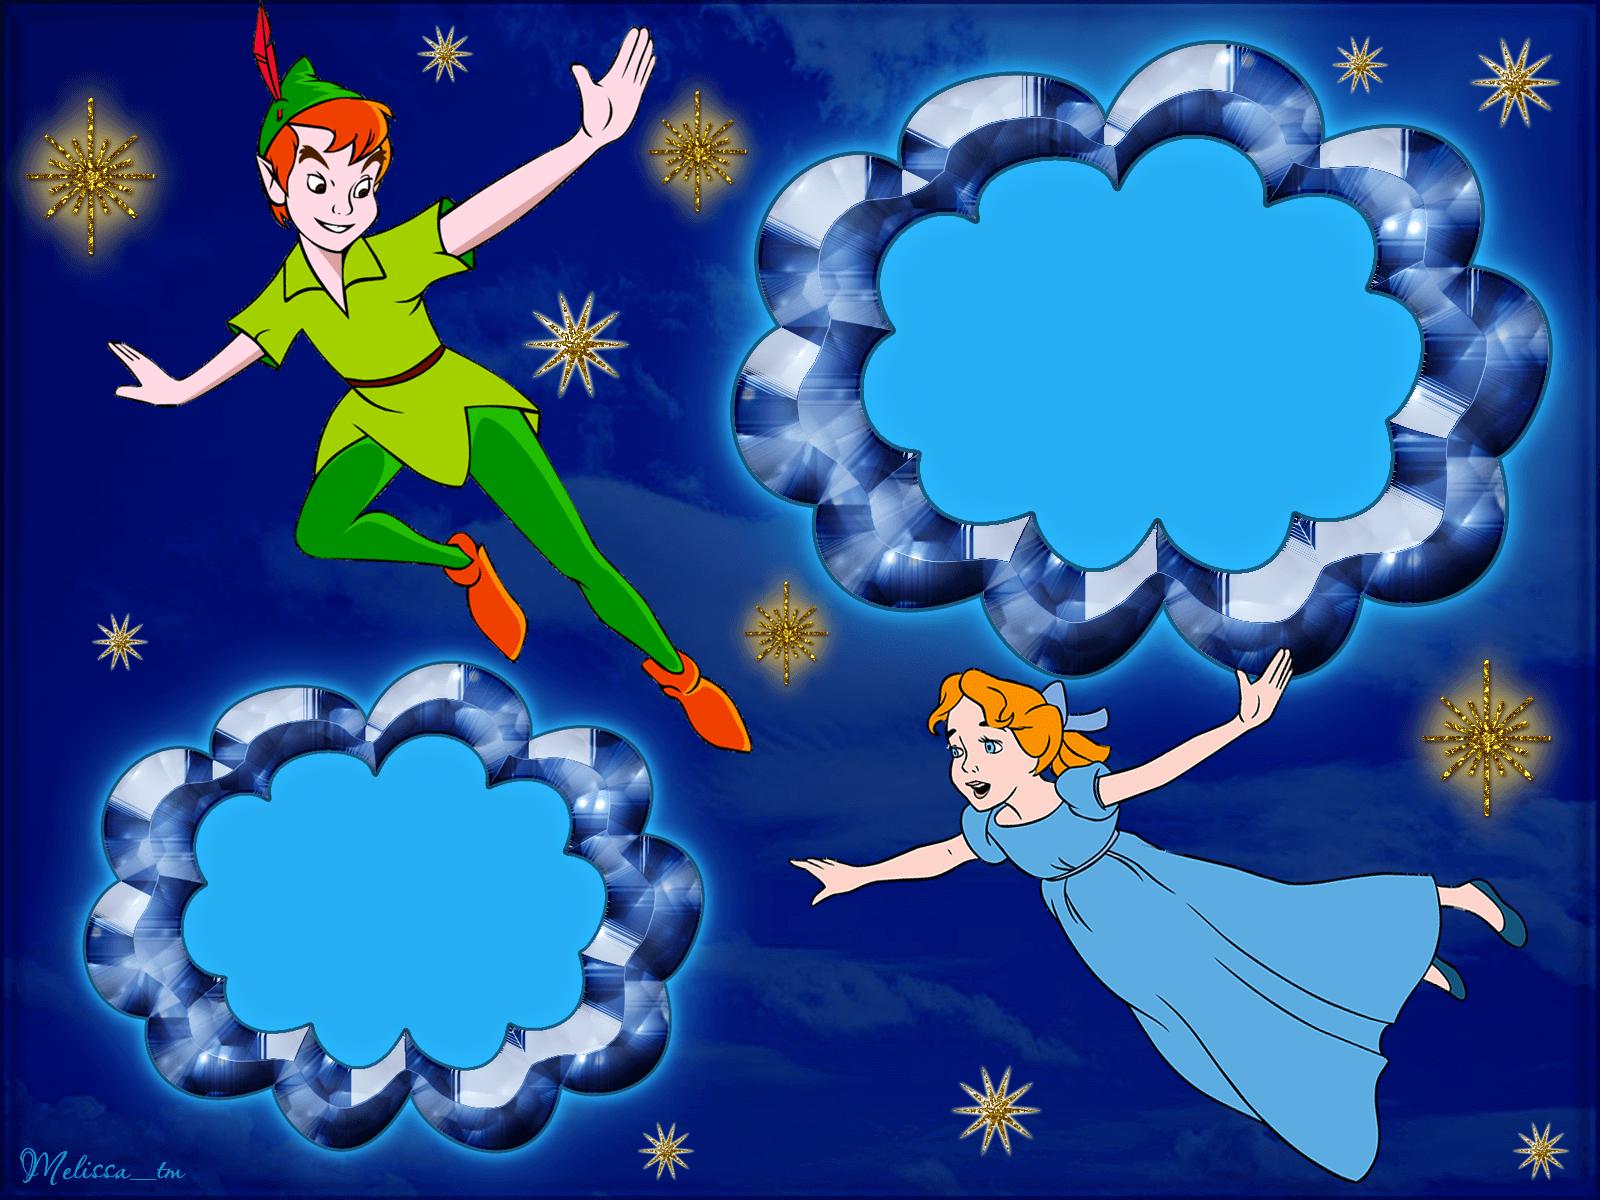 Marco Para Foto Peter Pan - Marco Para Foto Peter Pan